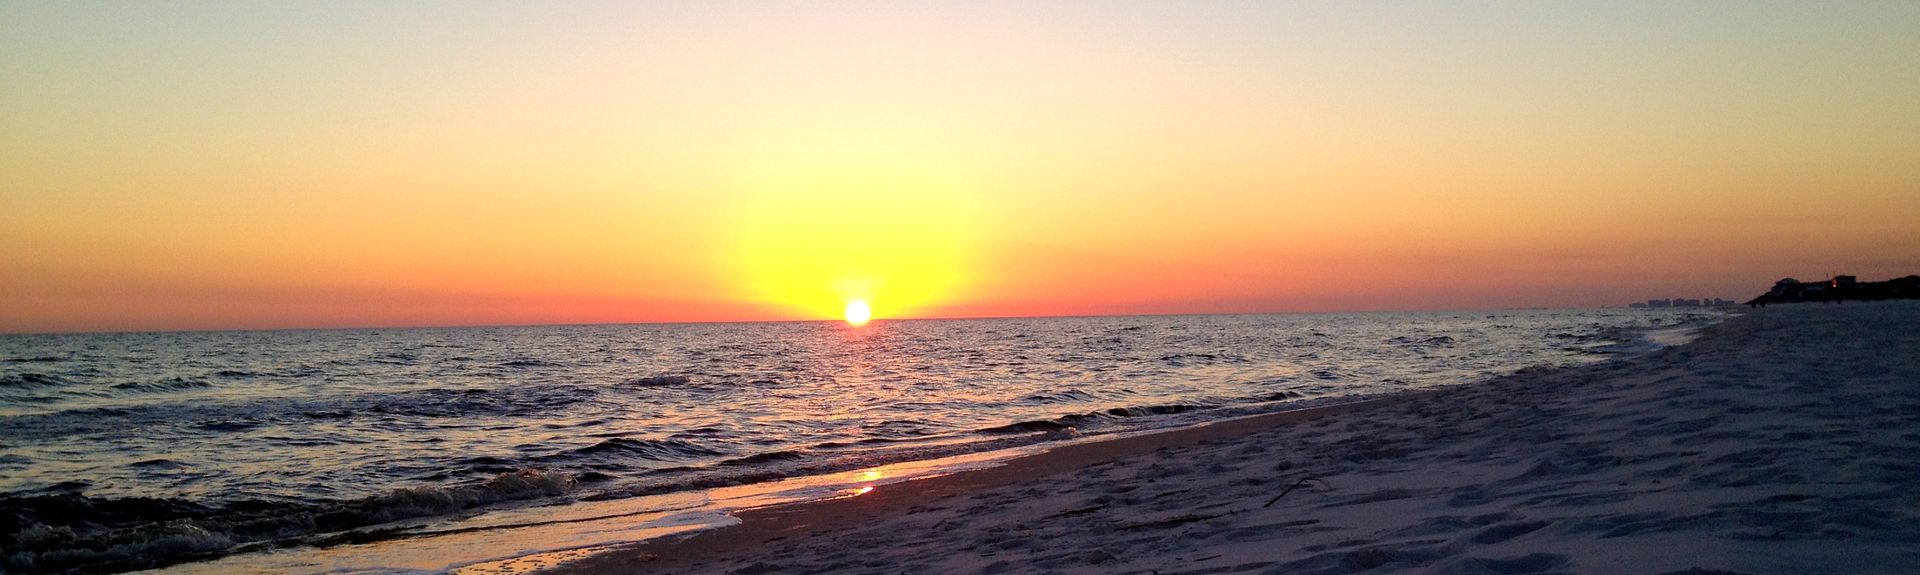 Gulf Trace, Santa Rosa Beach, Florida, United States of America